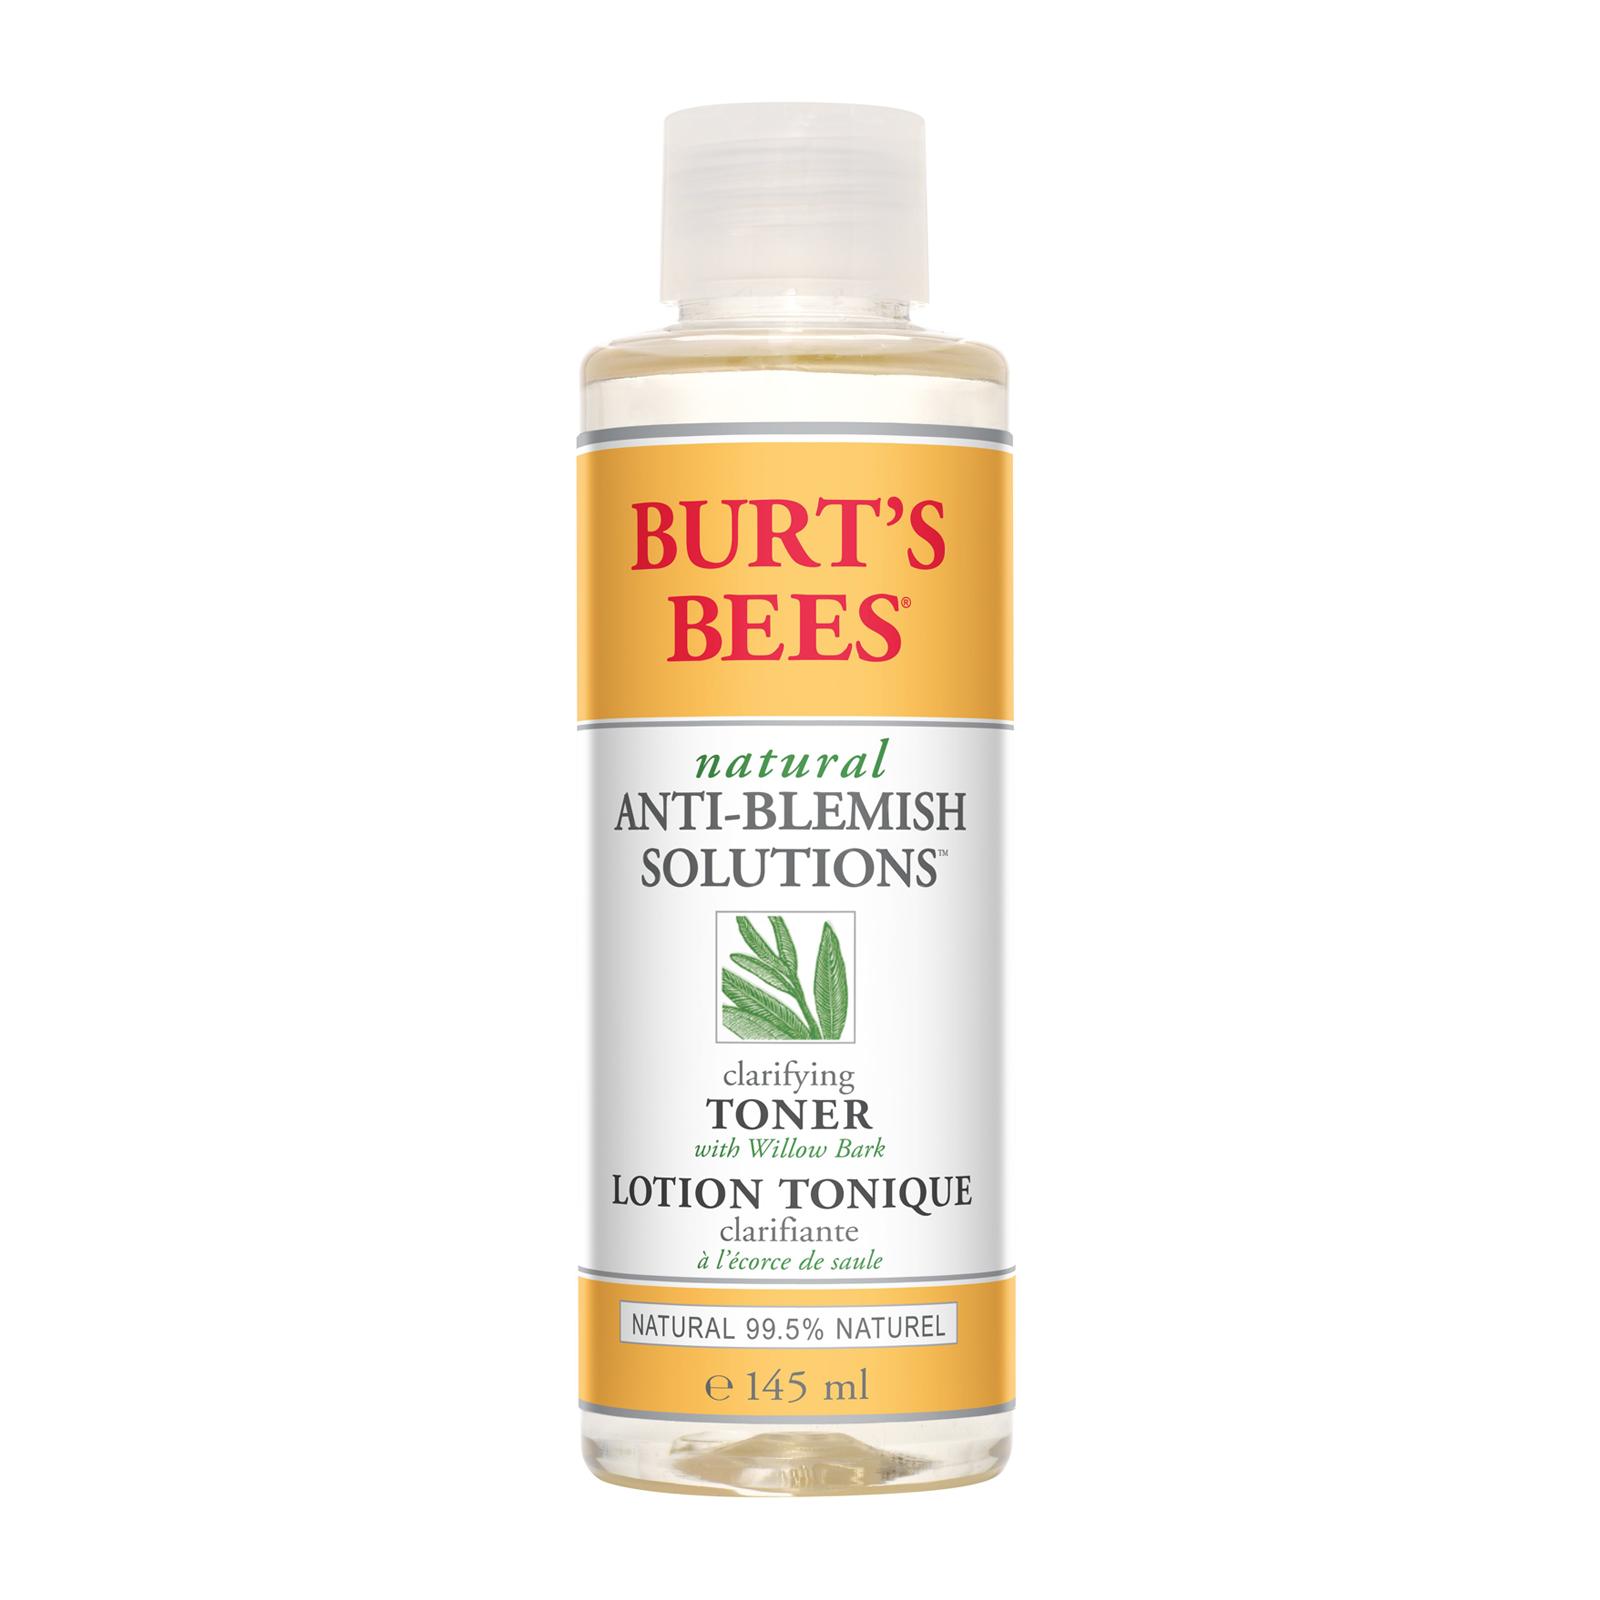 burts bees anti blemish solutions clarifying toner